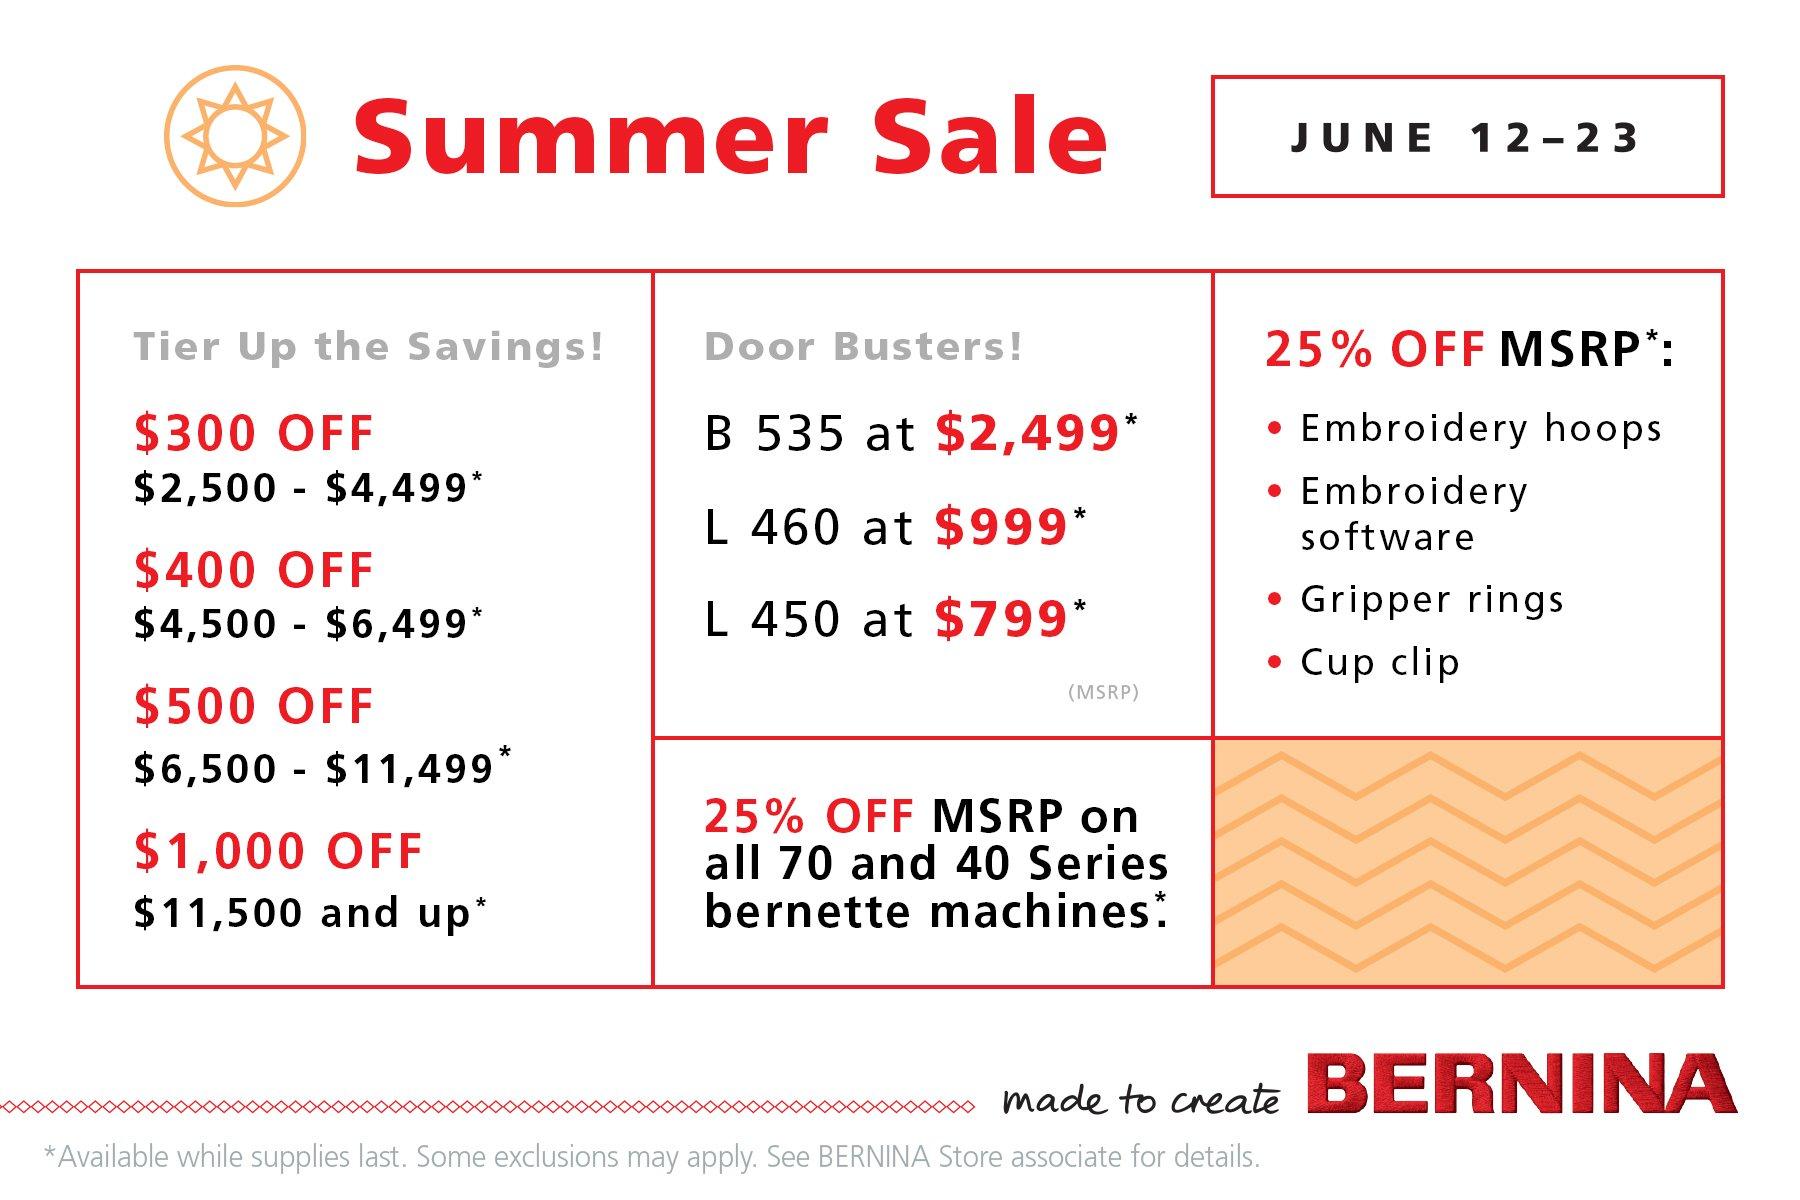 BERNINA Summer Sale